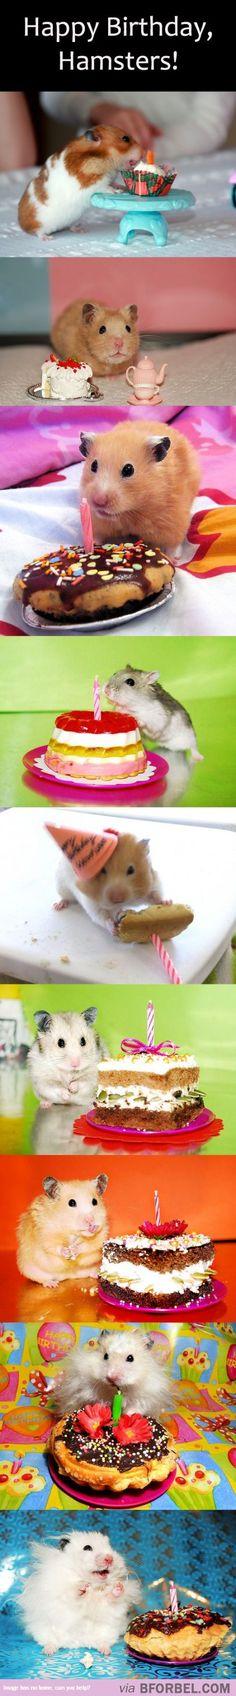 9 Hamsters Celebrating Their Birthdays…